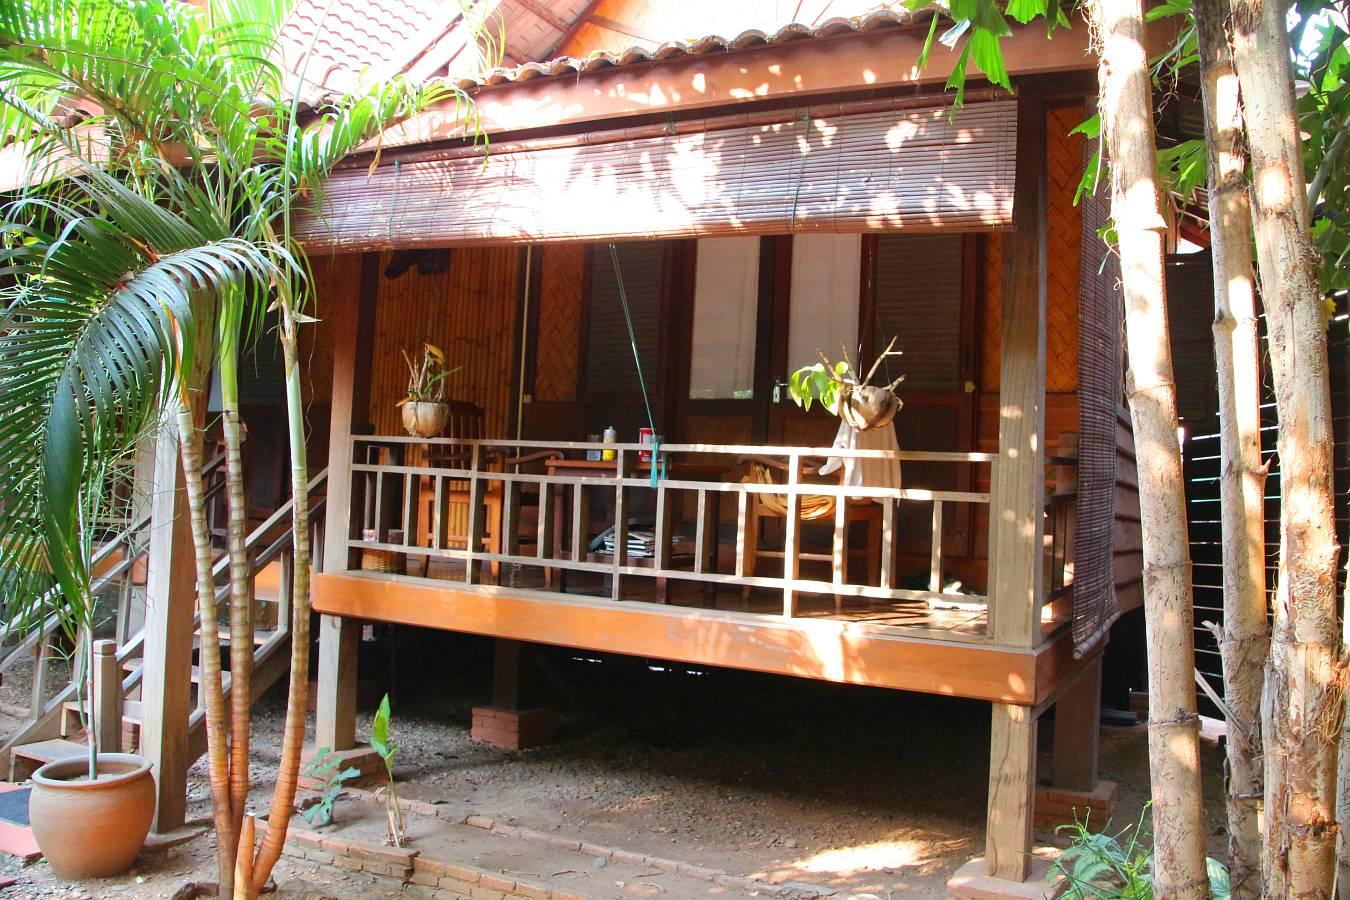 Laos, Vientiane, Hotel Sala Inpeng